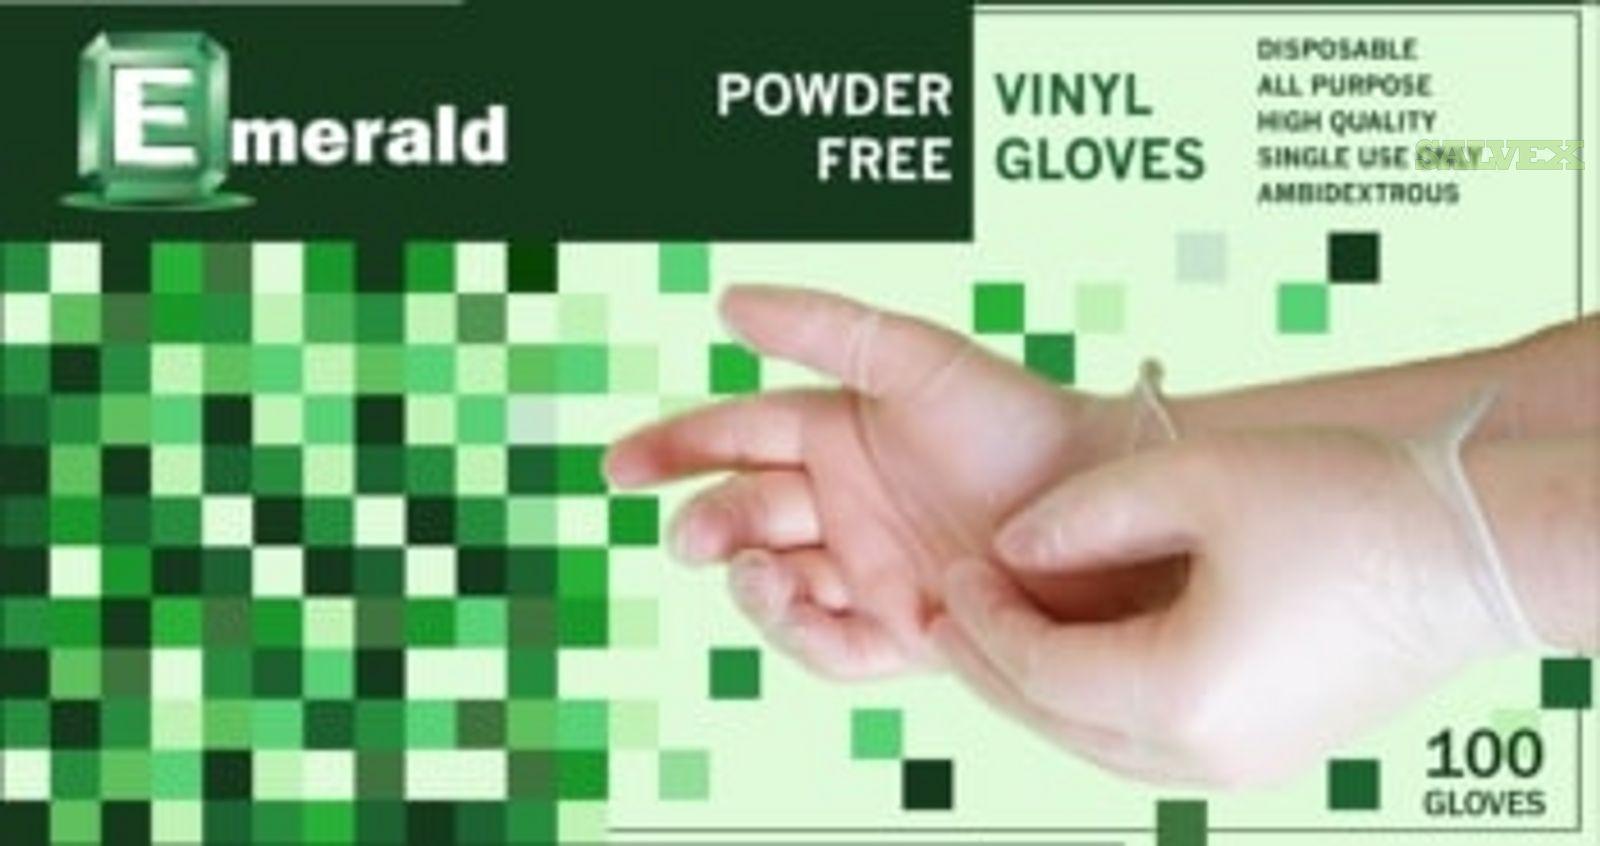 Emerald Shannon Powder-Free Vinyl Gloves (1,584 Cases / 14 Pallets)